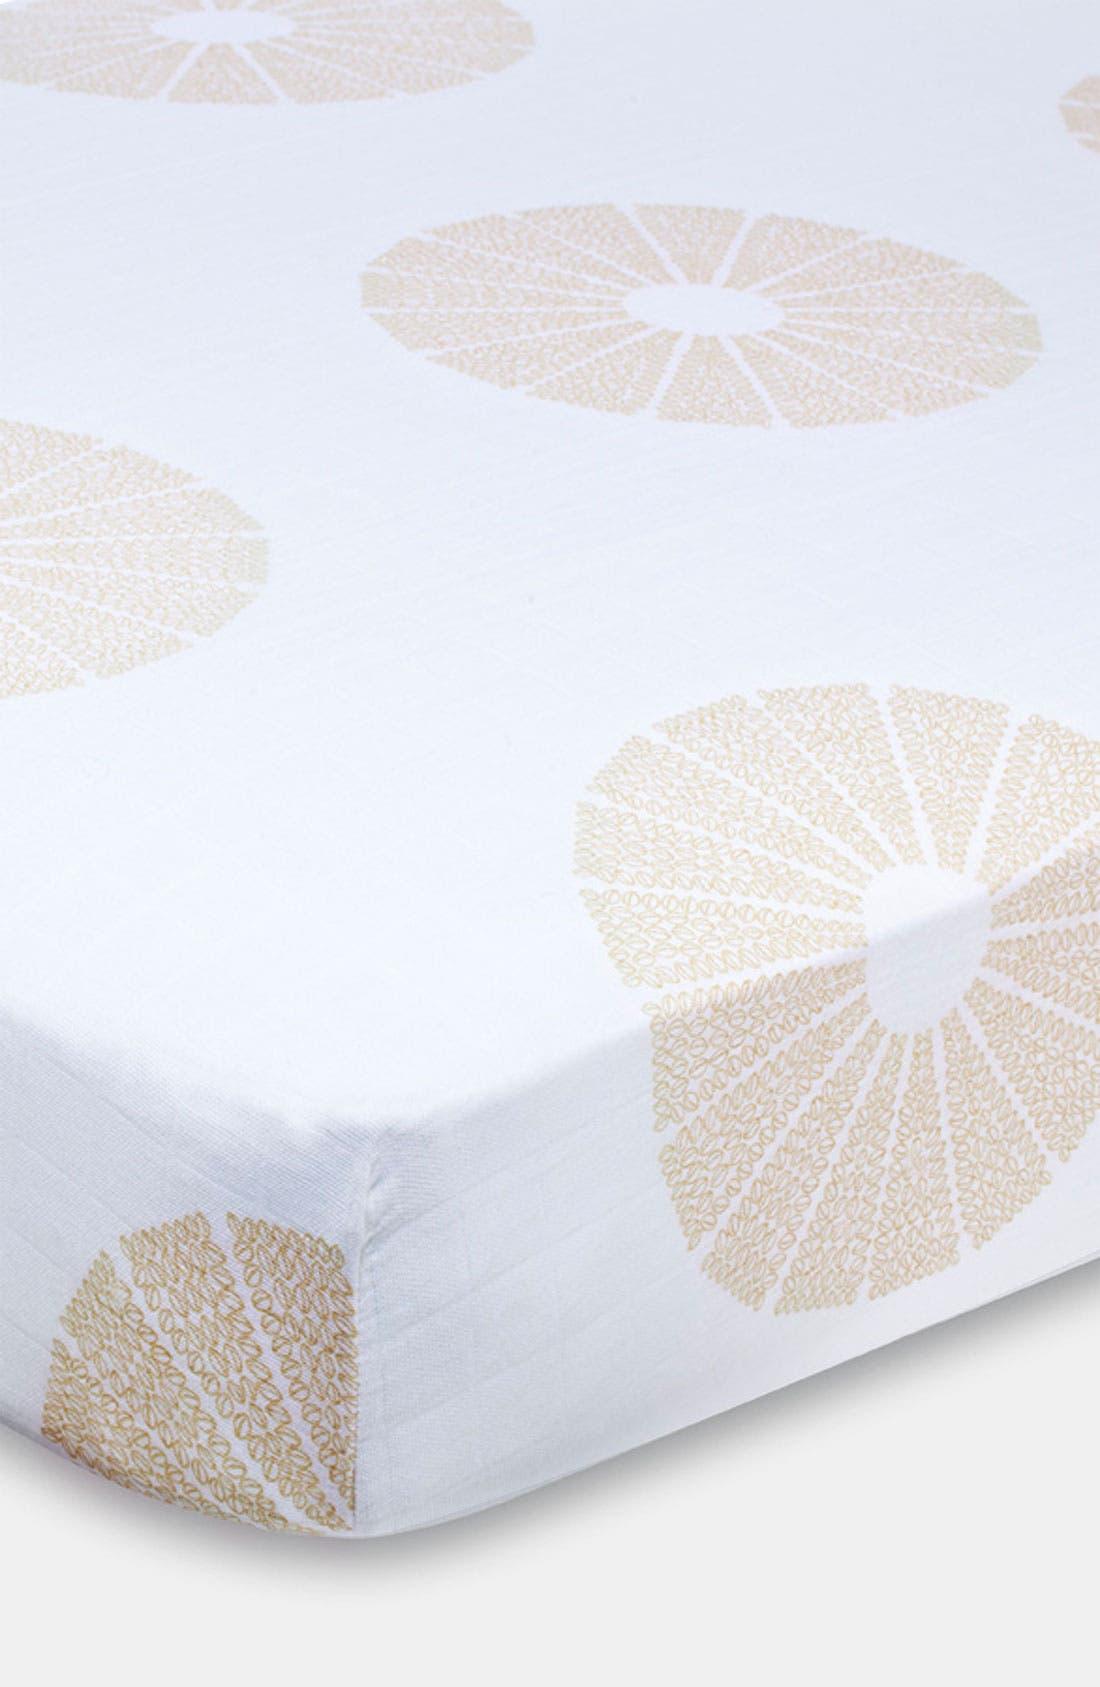 Main Image - aden + anais Organic Crib Sheet